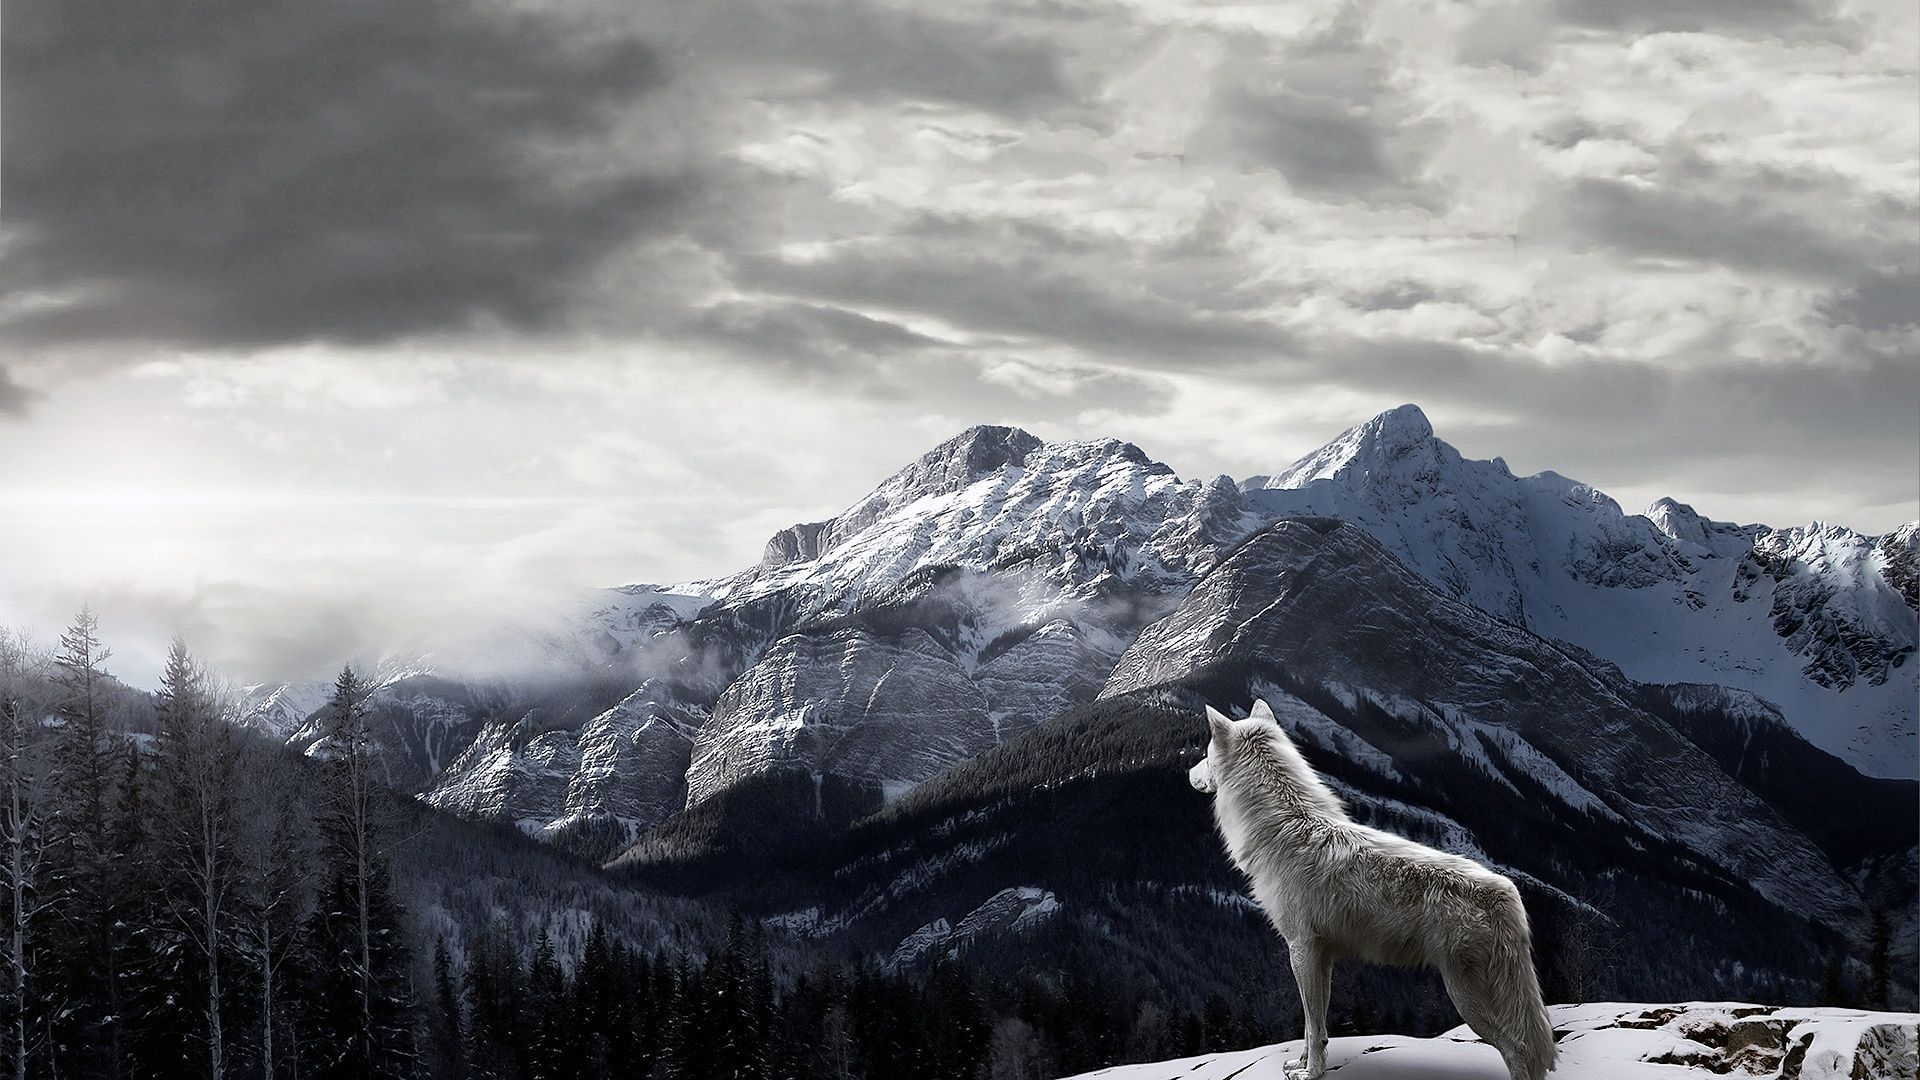 Hd wallpaper wolf - Wolf Hd Wallpapers Backgrounds Wallpaper